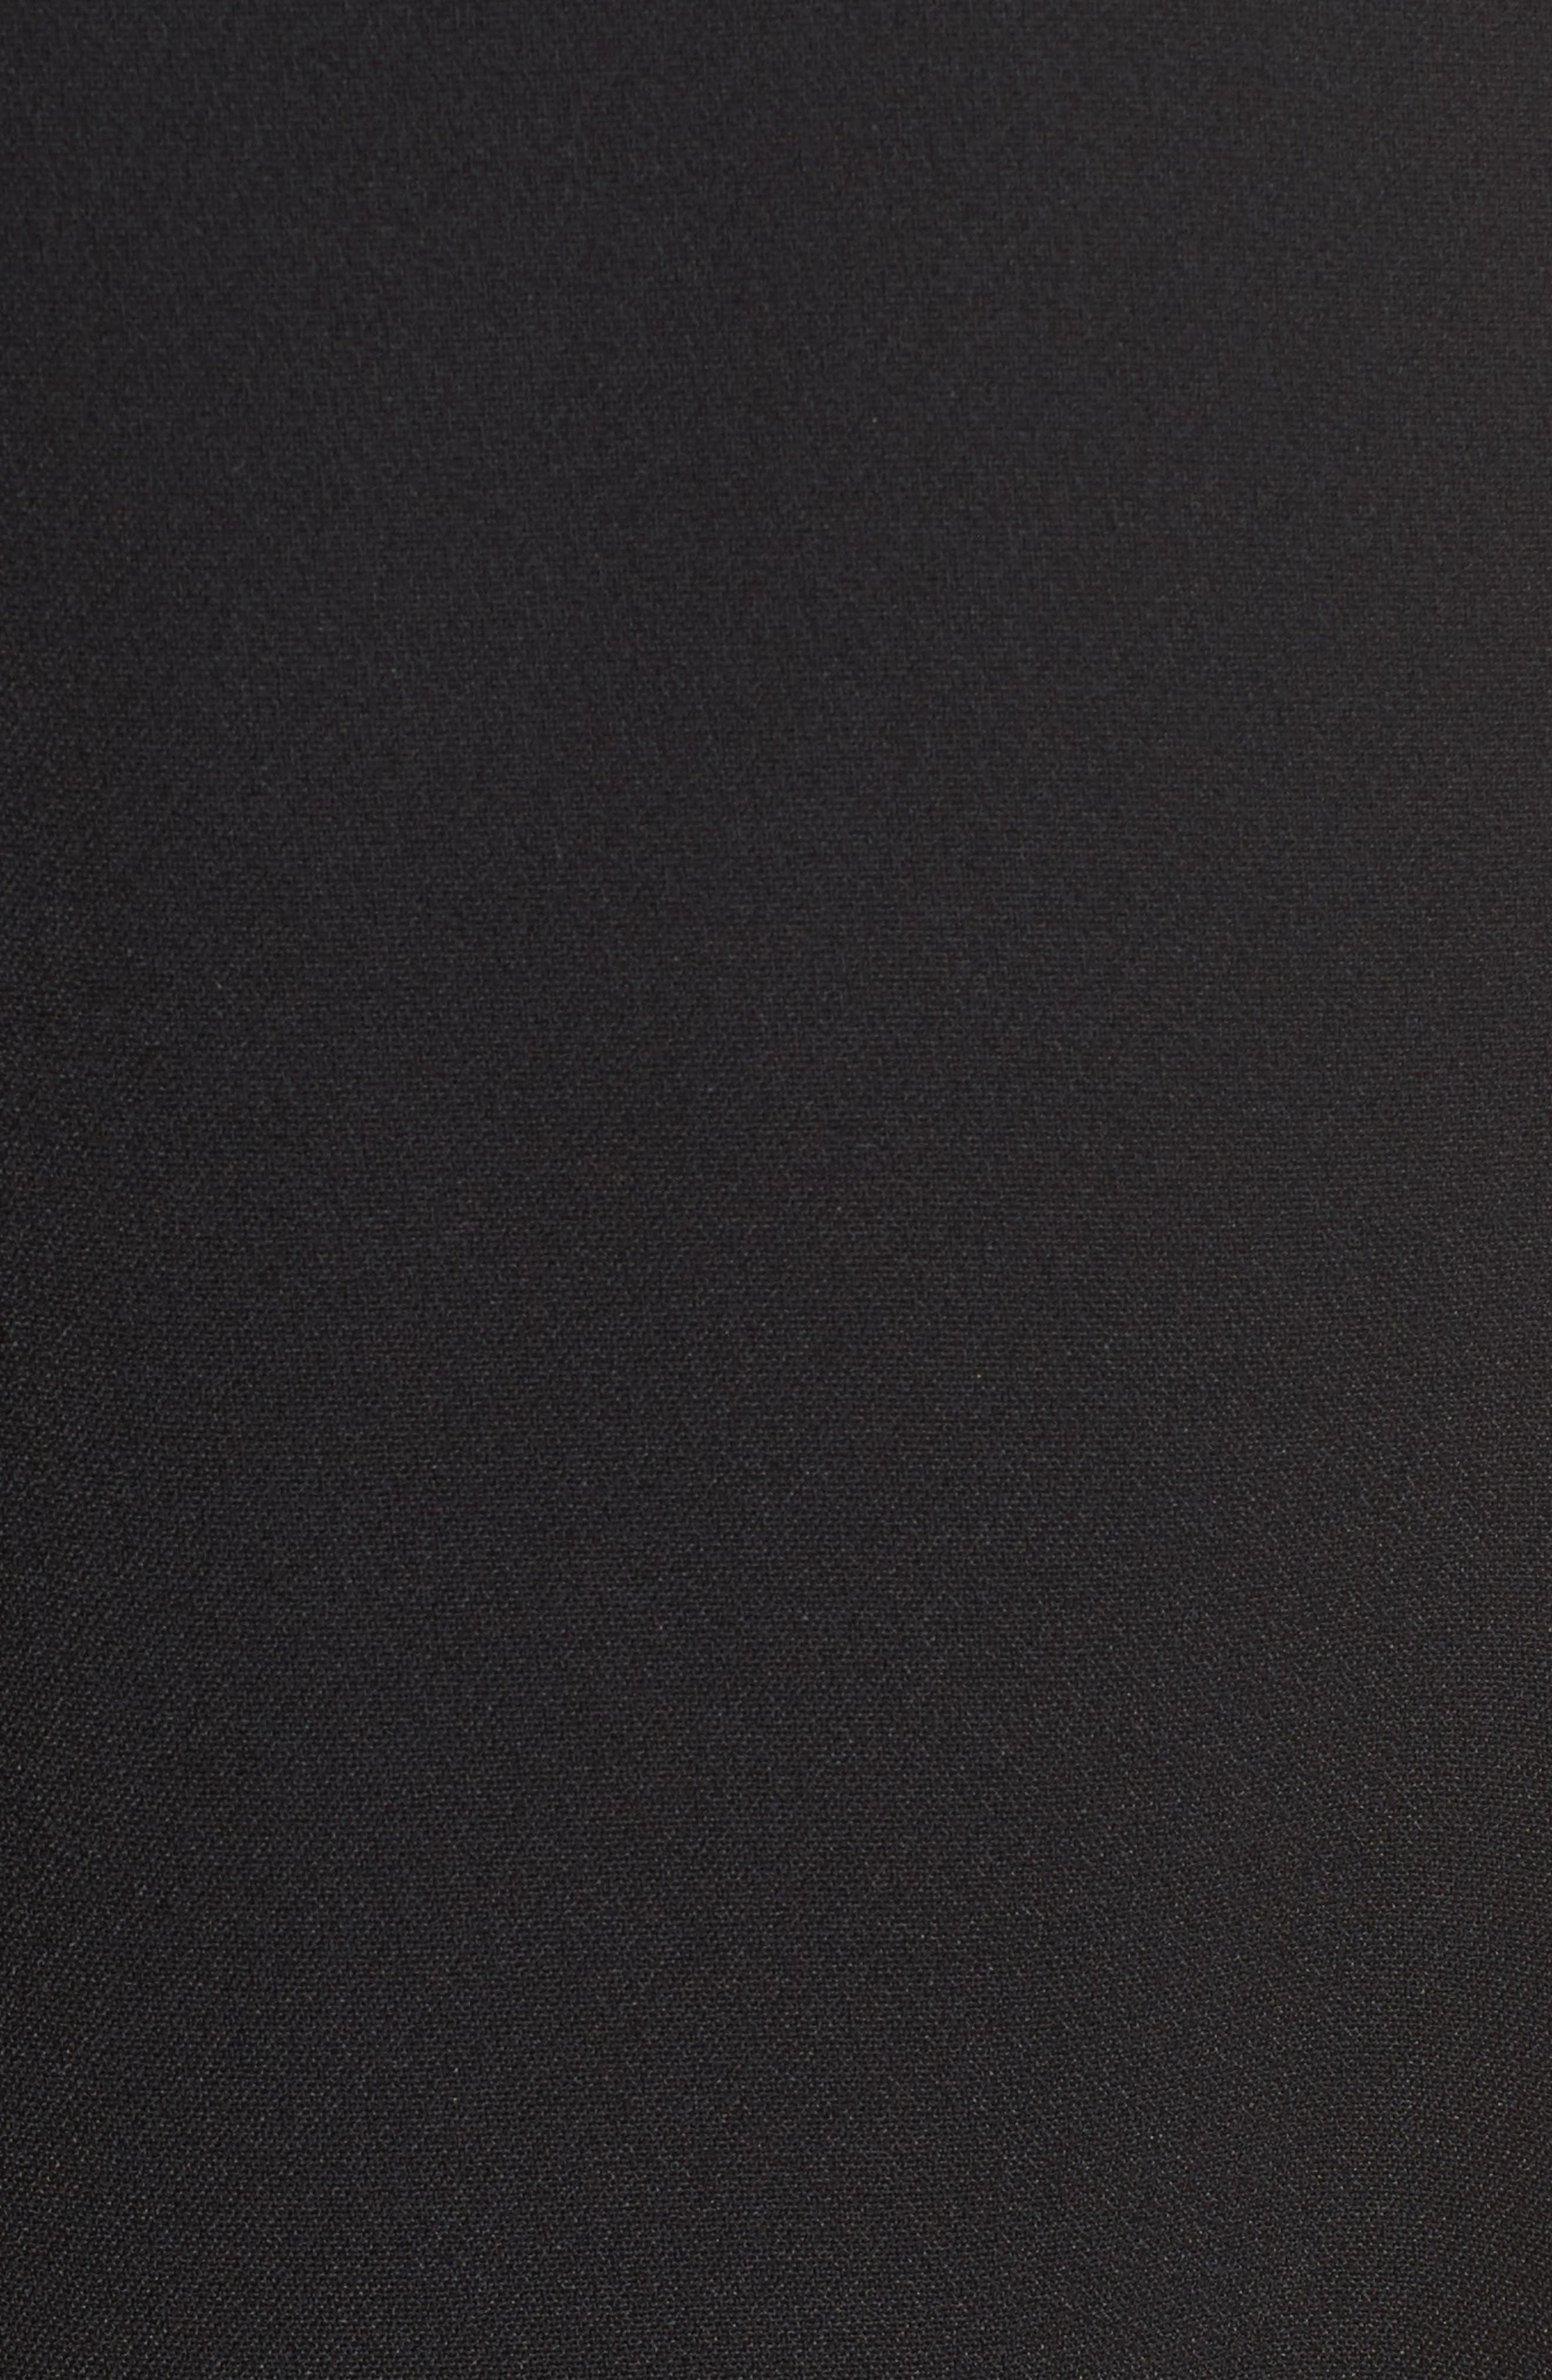 Leather Fringe Wrap Dress,                             Alternate thumbnail 5, color,                             001